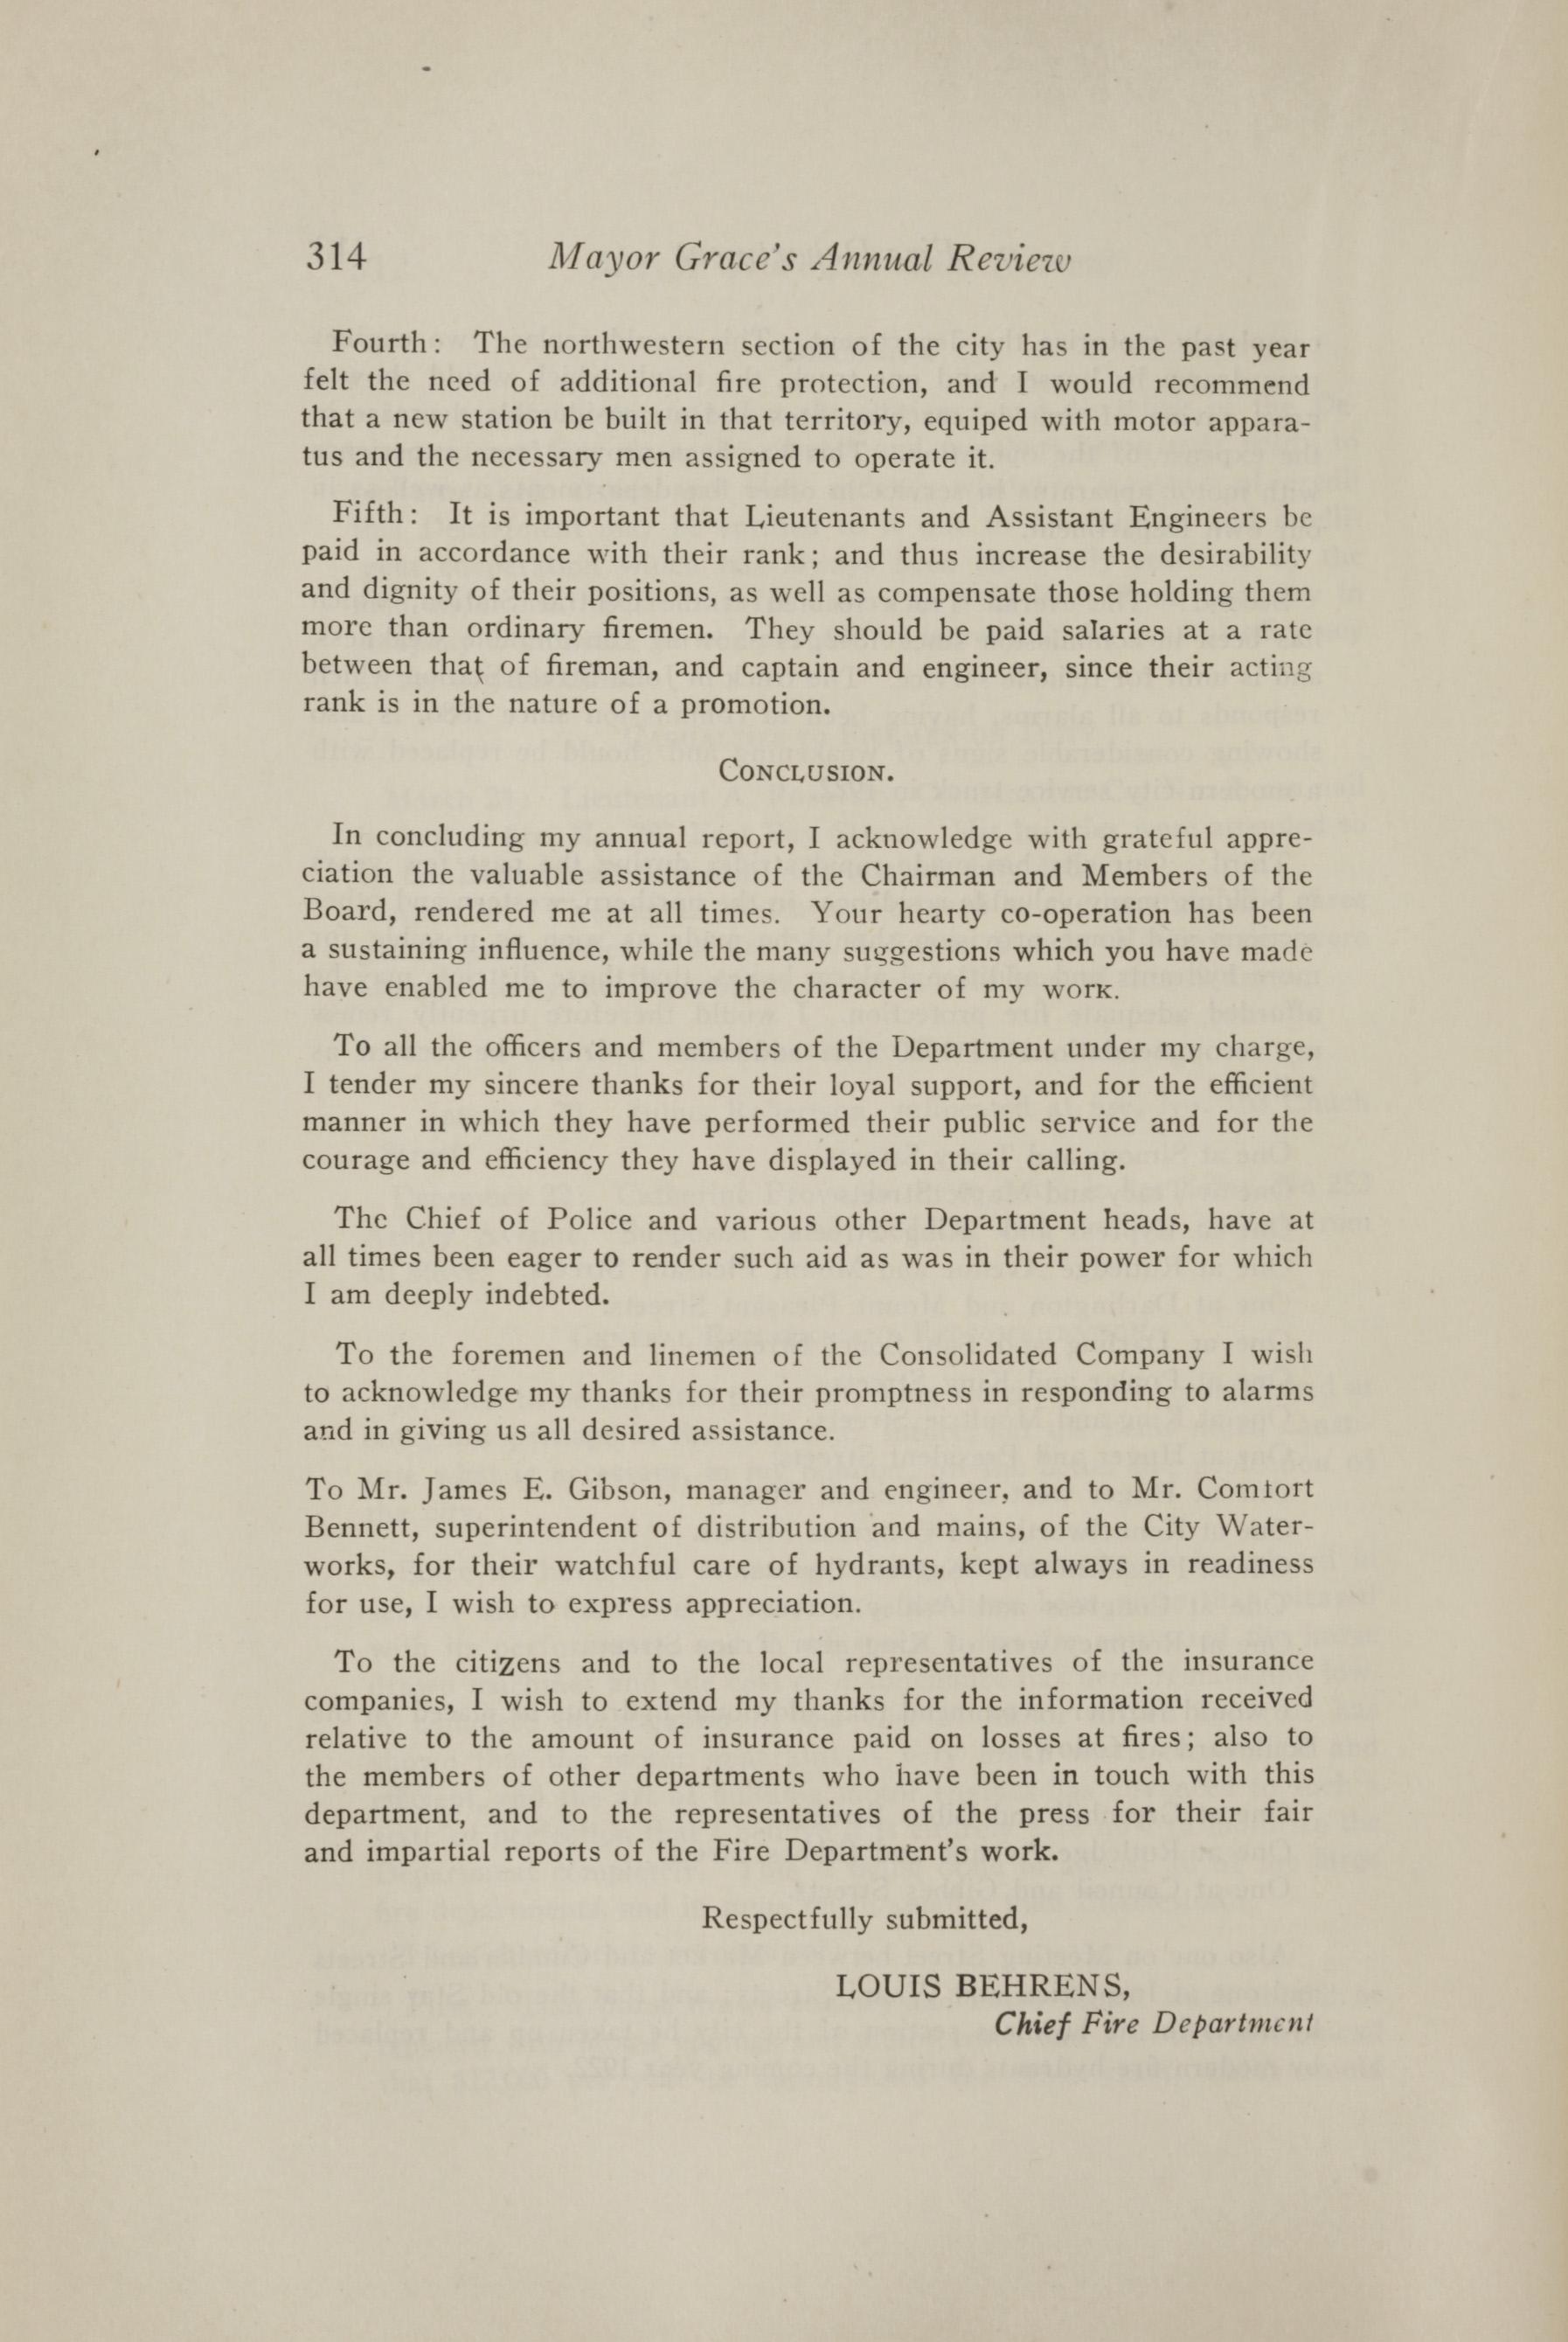 Charleston Yearbook, 1921, page 314